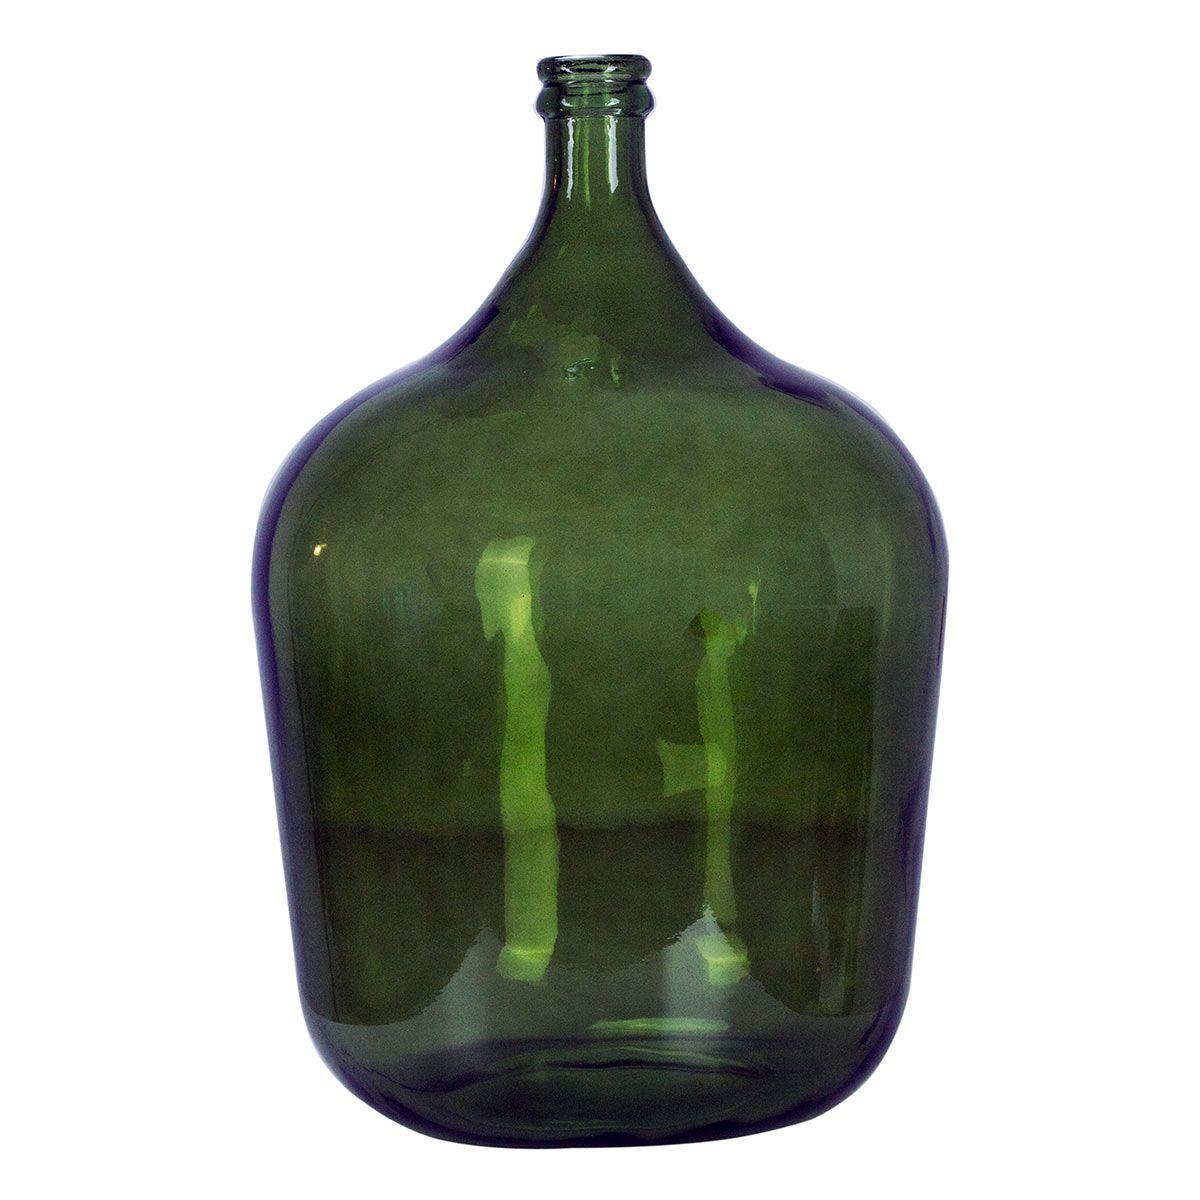 Bonbonne dame jeanne 34L vert